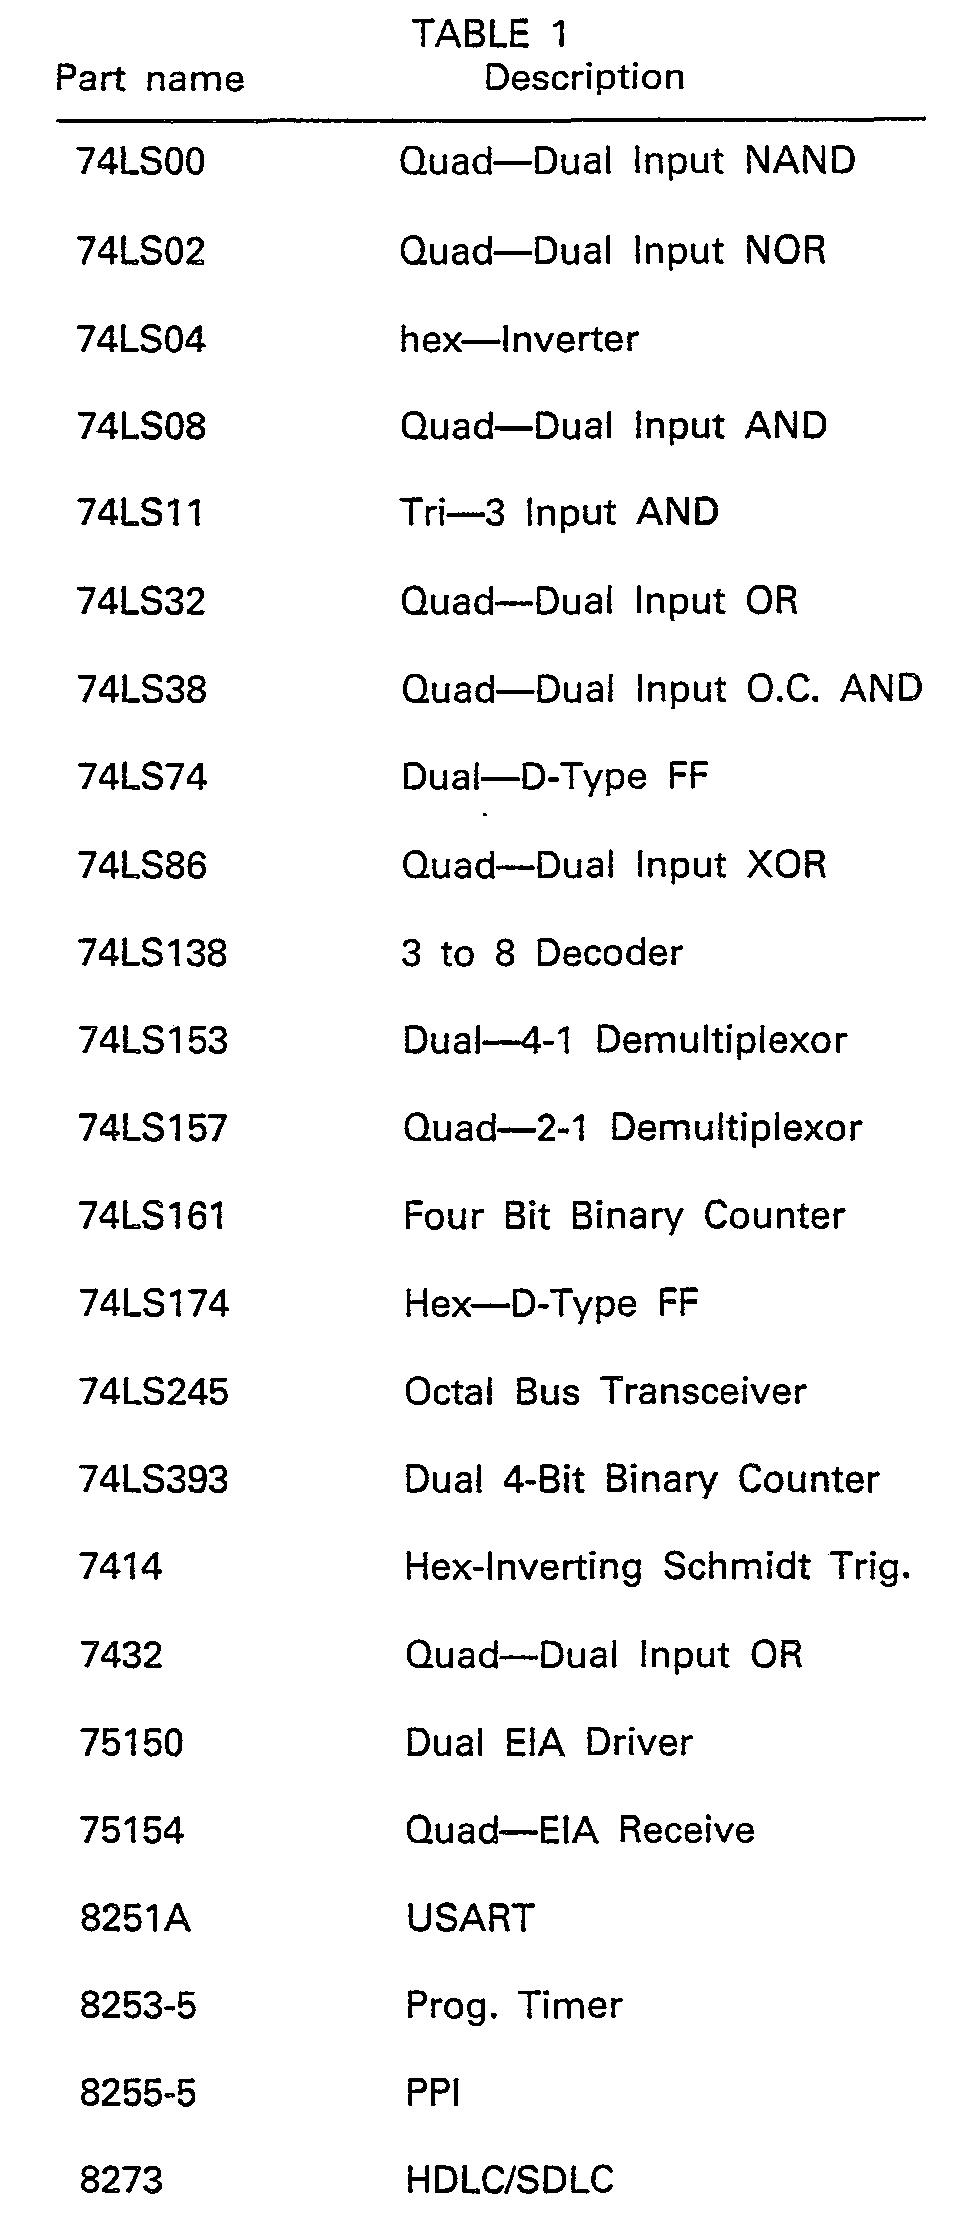 Ep0067310b1 Bisynchronous Protocol Communication Circuit Google Diagram Motorola 2000 Cell Phone Figure Imgb0001